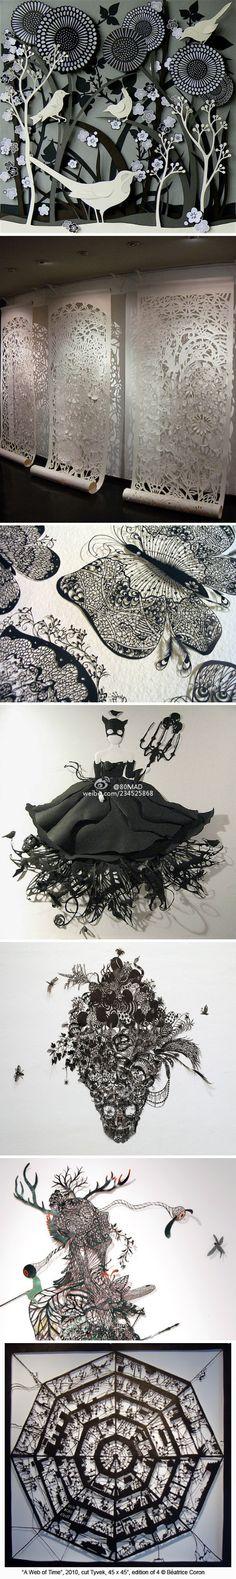 DIY handmade paper-cut design so intricate